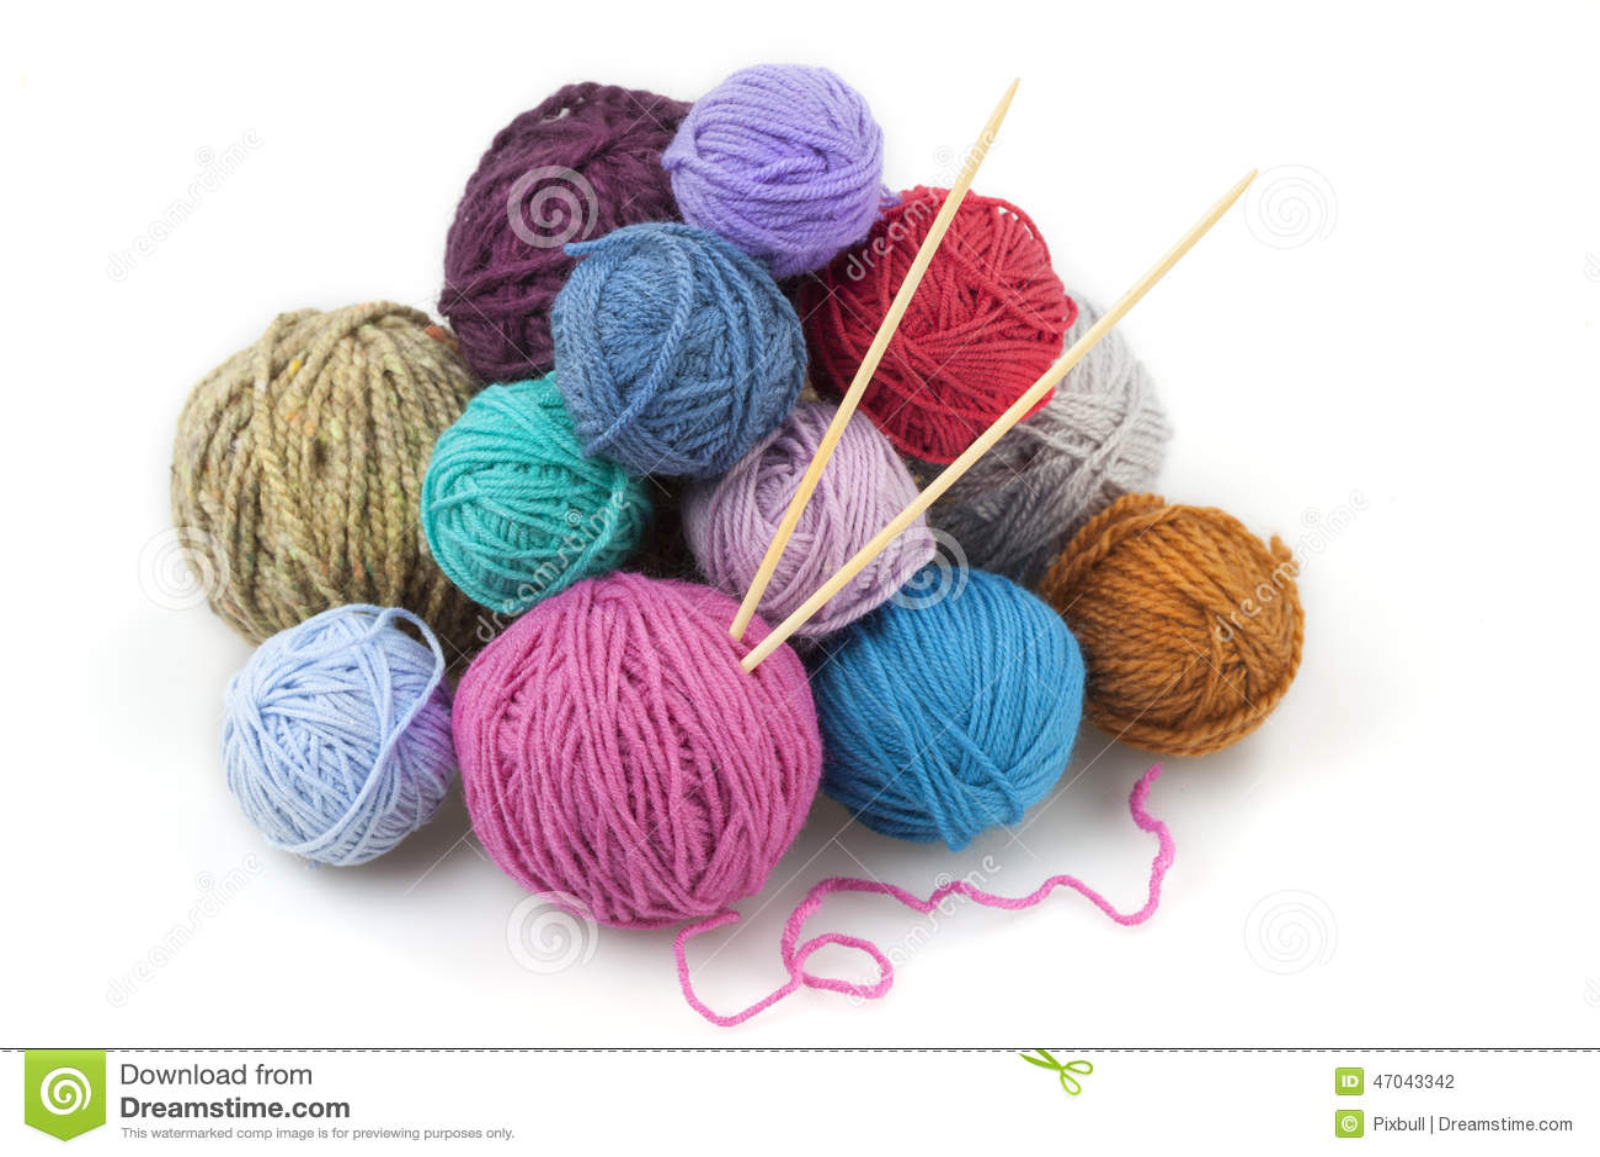 ball of yarn crochet - photo #26